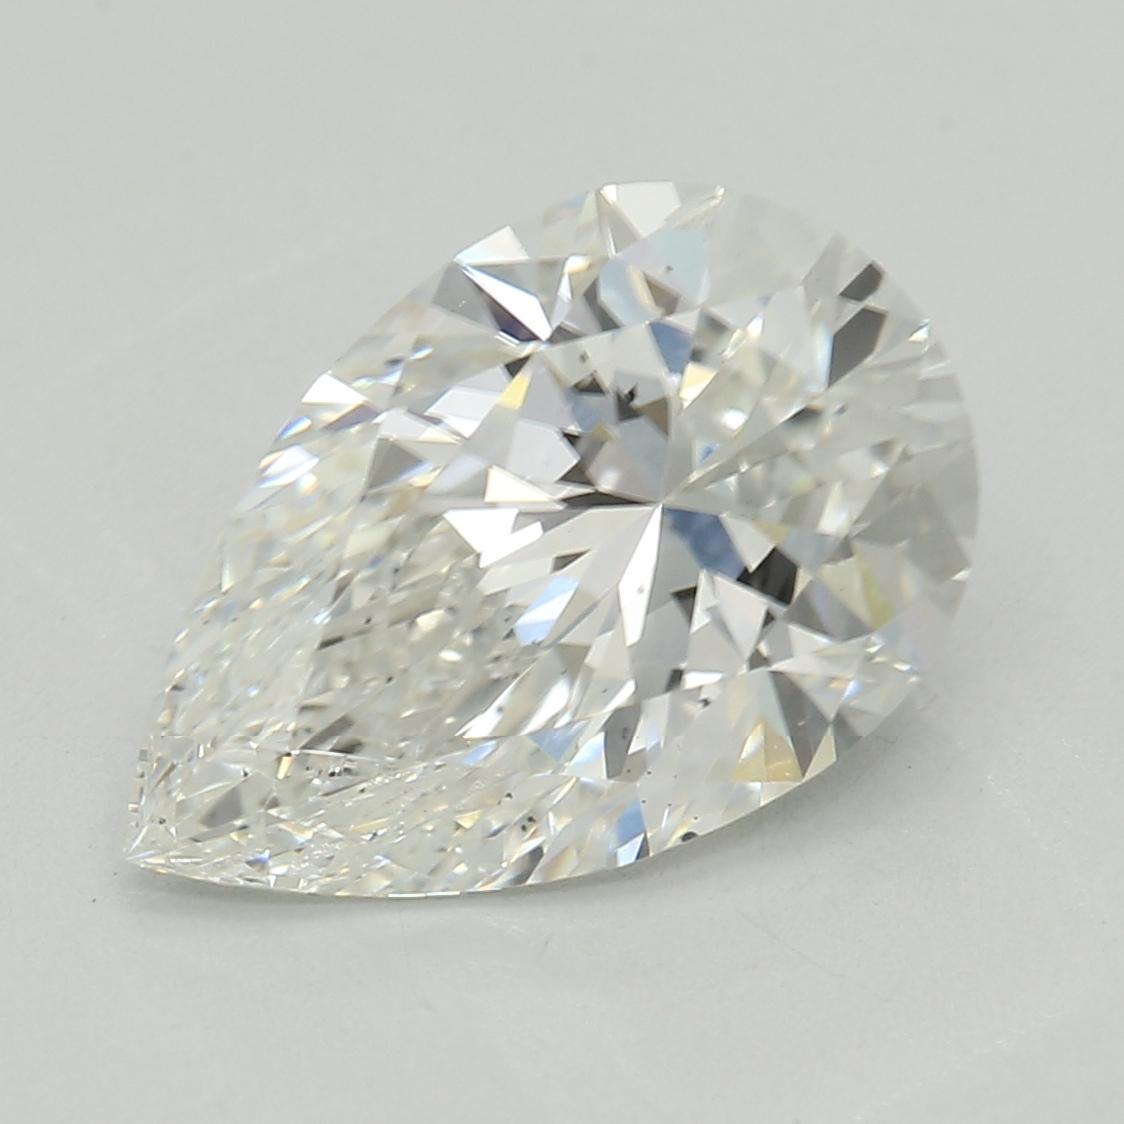 Pear Cut 1.51 Carat G Color Si1 Clarity Sku Lg9041426